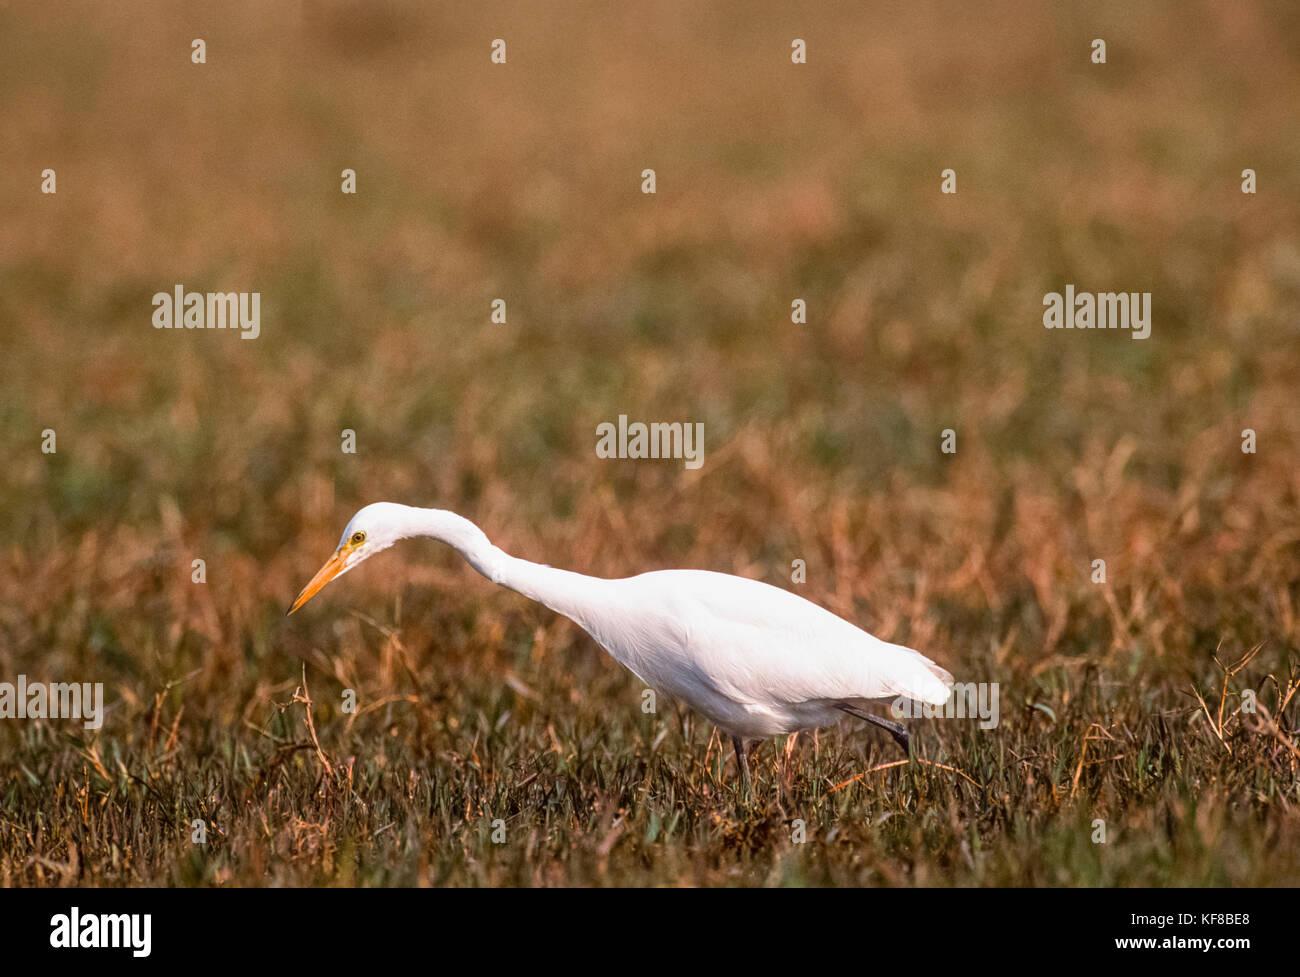 Great White Egret,(Ardea alba), hunting on wetlands, Keoladeo Ghana National Park, Bharatpur, Rajasthan, India - Stock Image